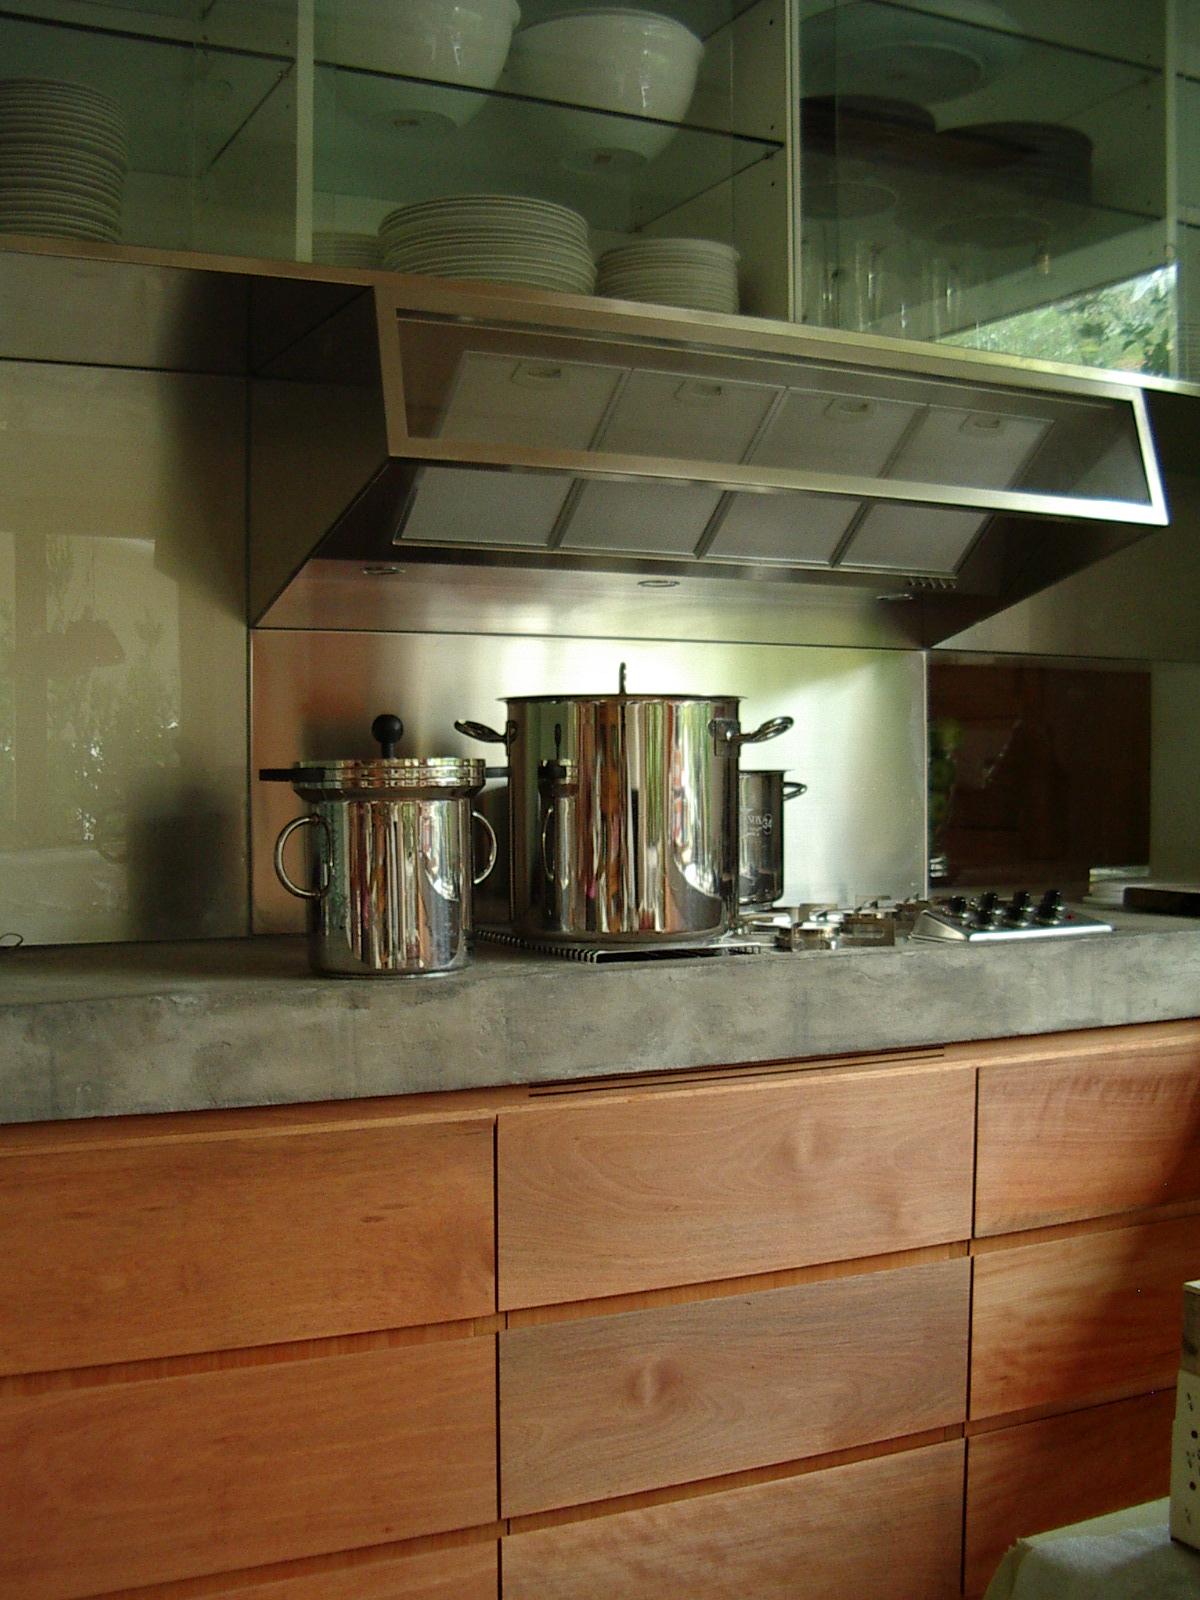 Bancone cucina miko design - Bancone cucina ...